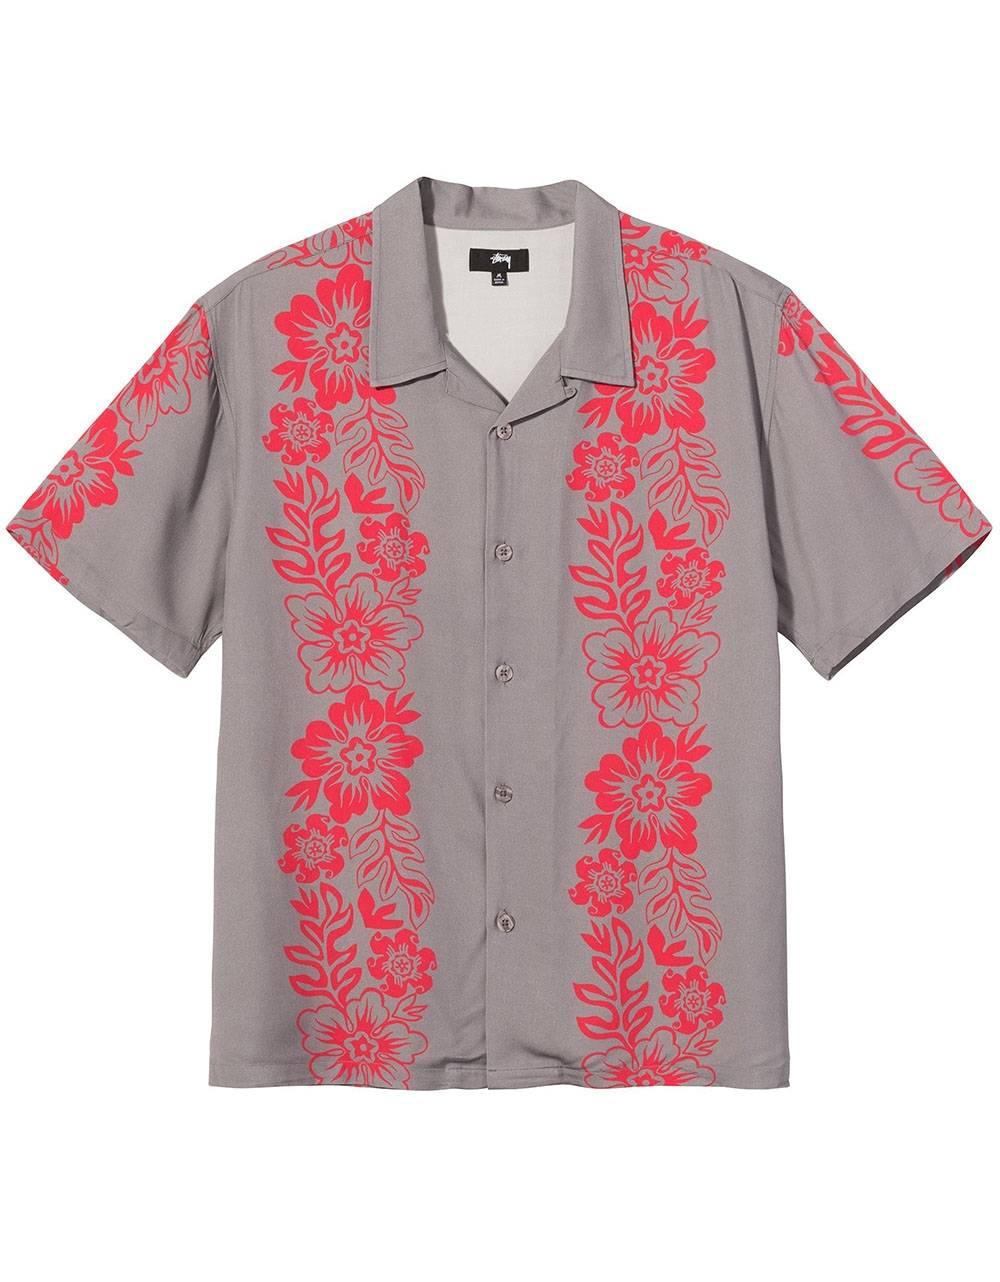 Stussy Hawaiian pattern shirt - grey Stussy Shirt 122,13€